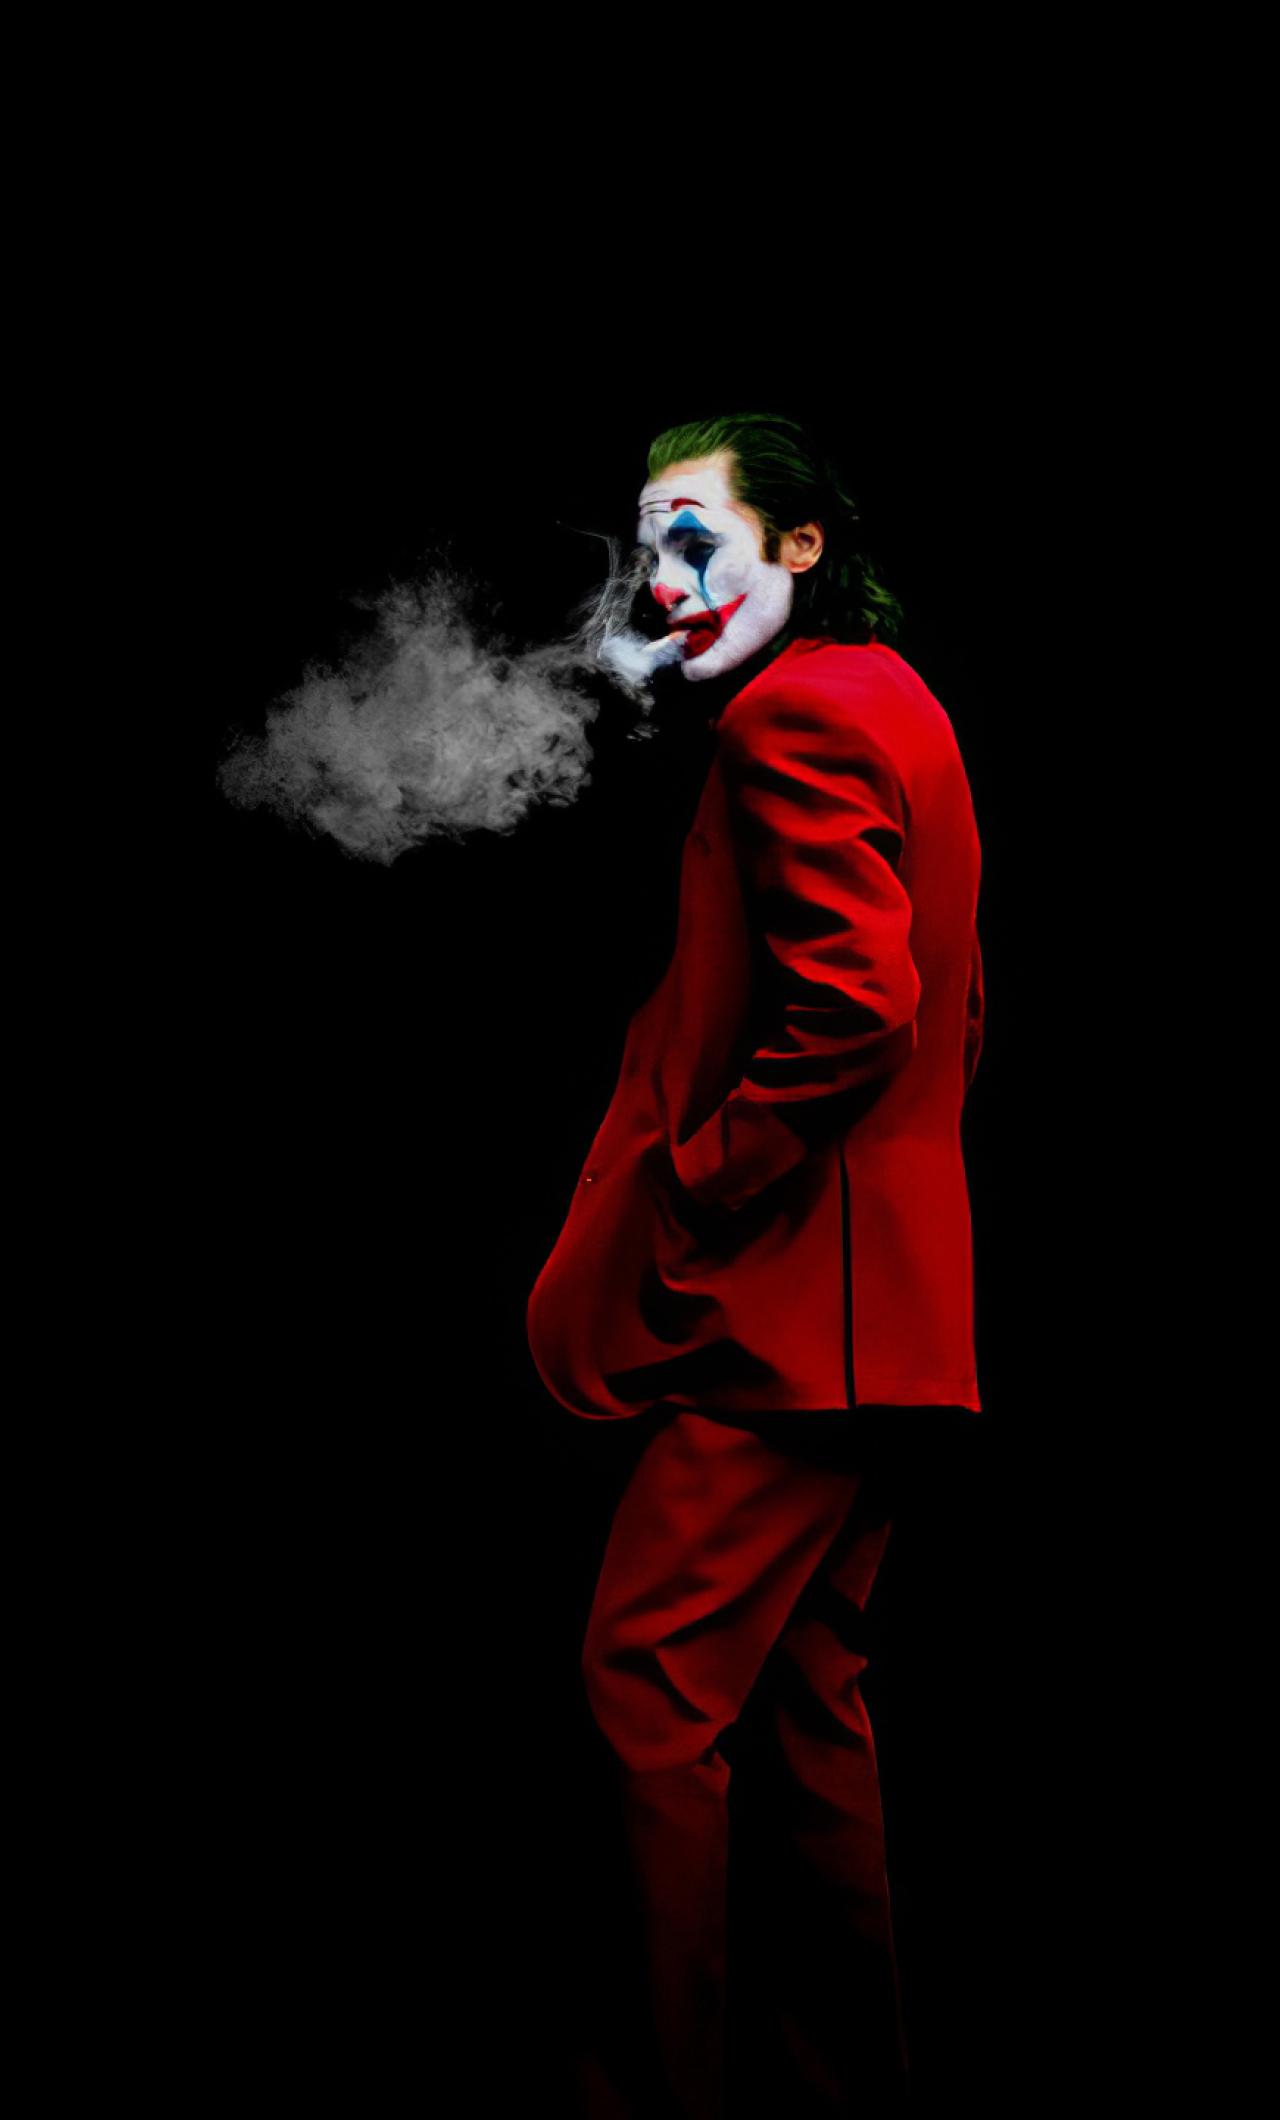 New Joker 2020 Art Wallpaper in 1280x2120 Resolution